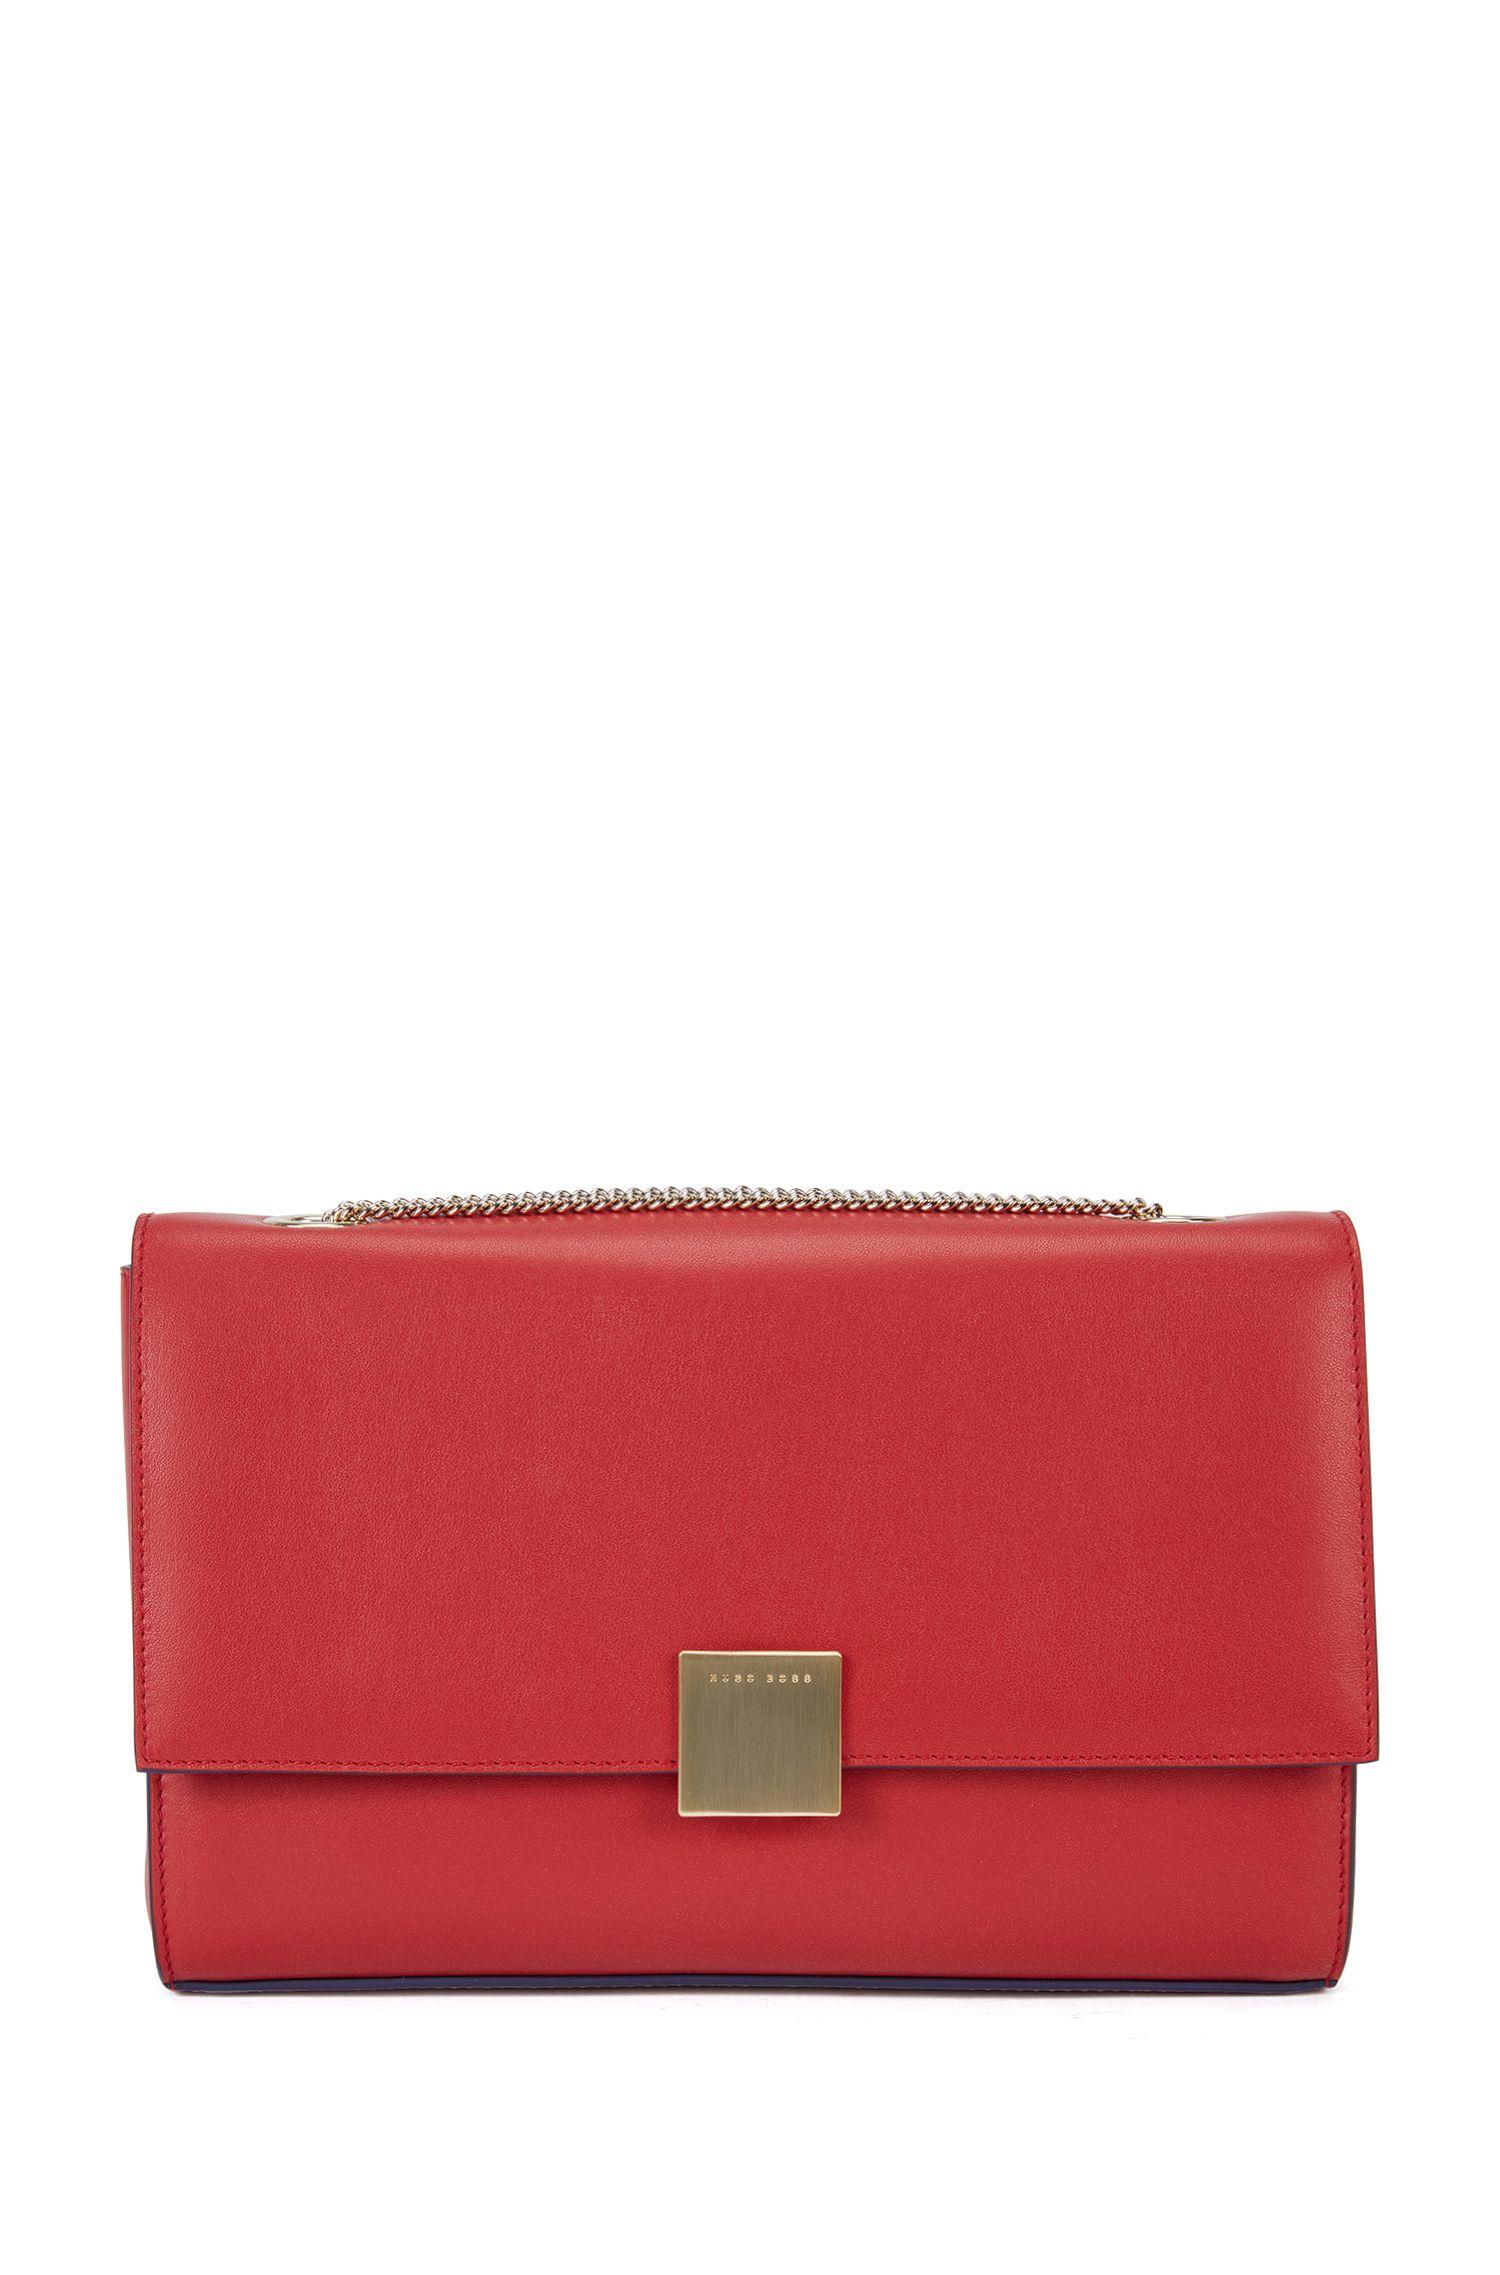 'Munich Flap N'   Italian Calfskin Handbag, Chain Strap